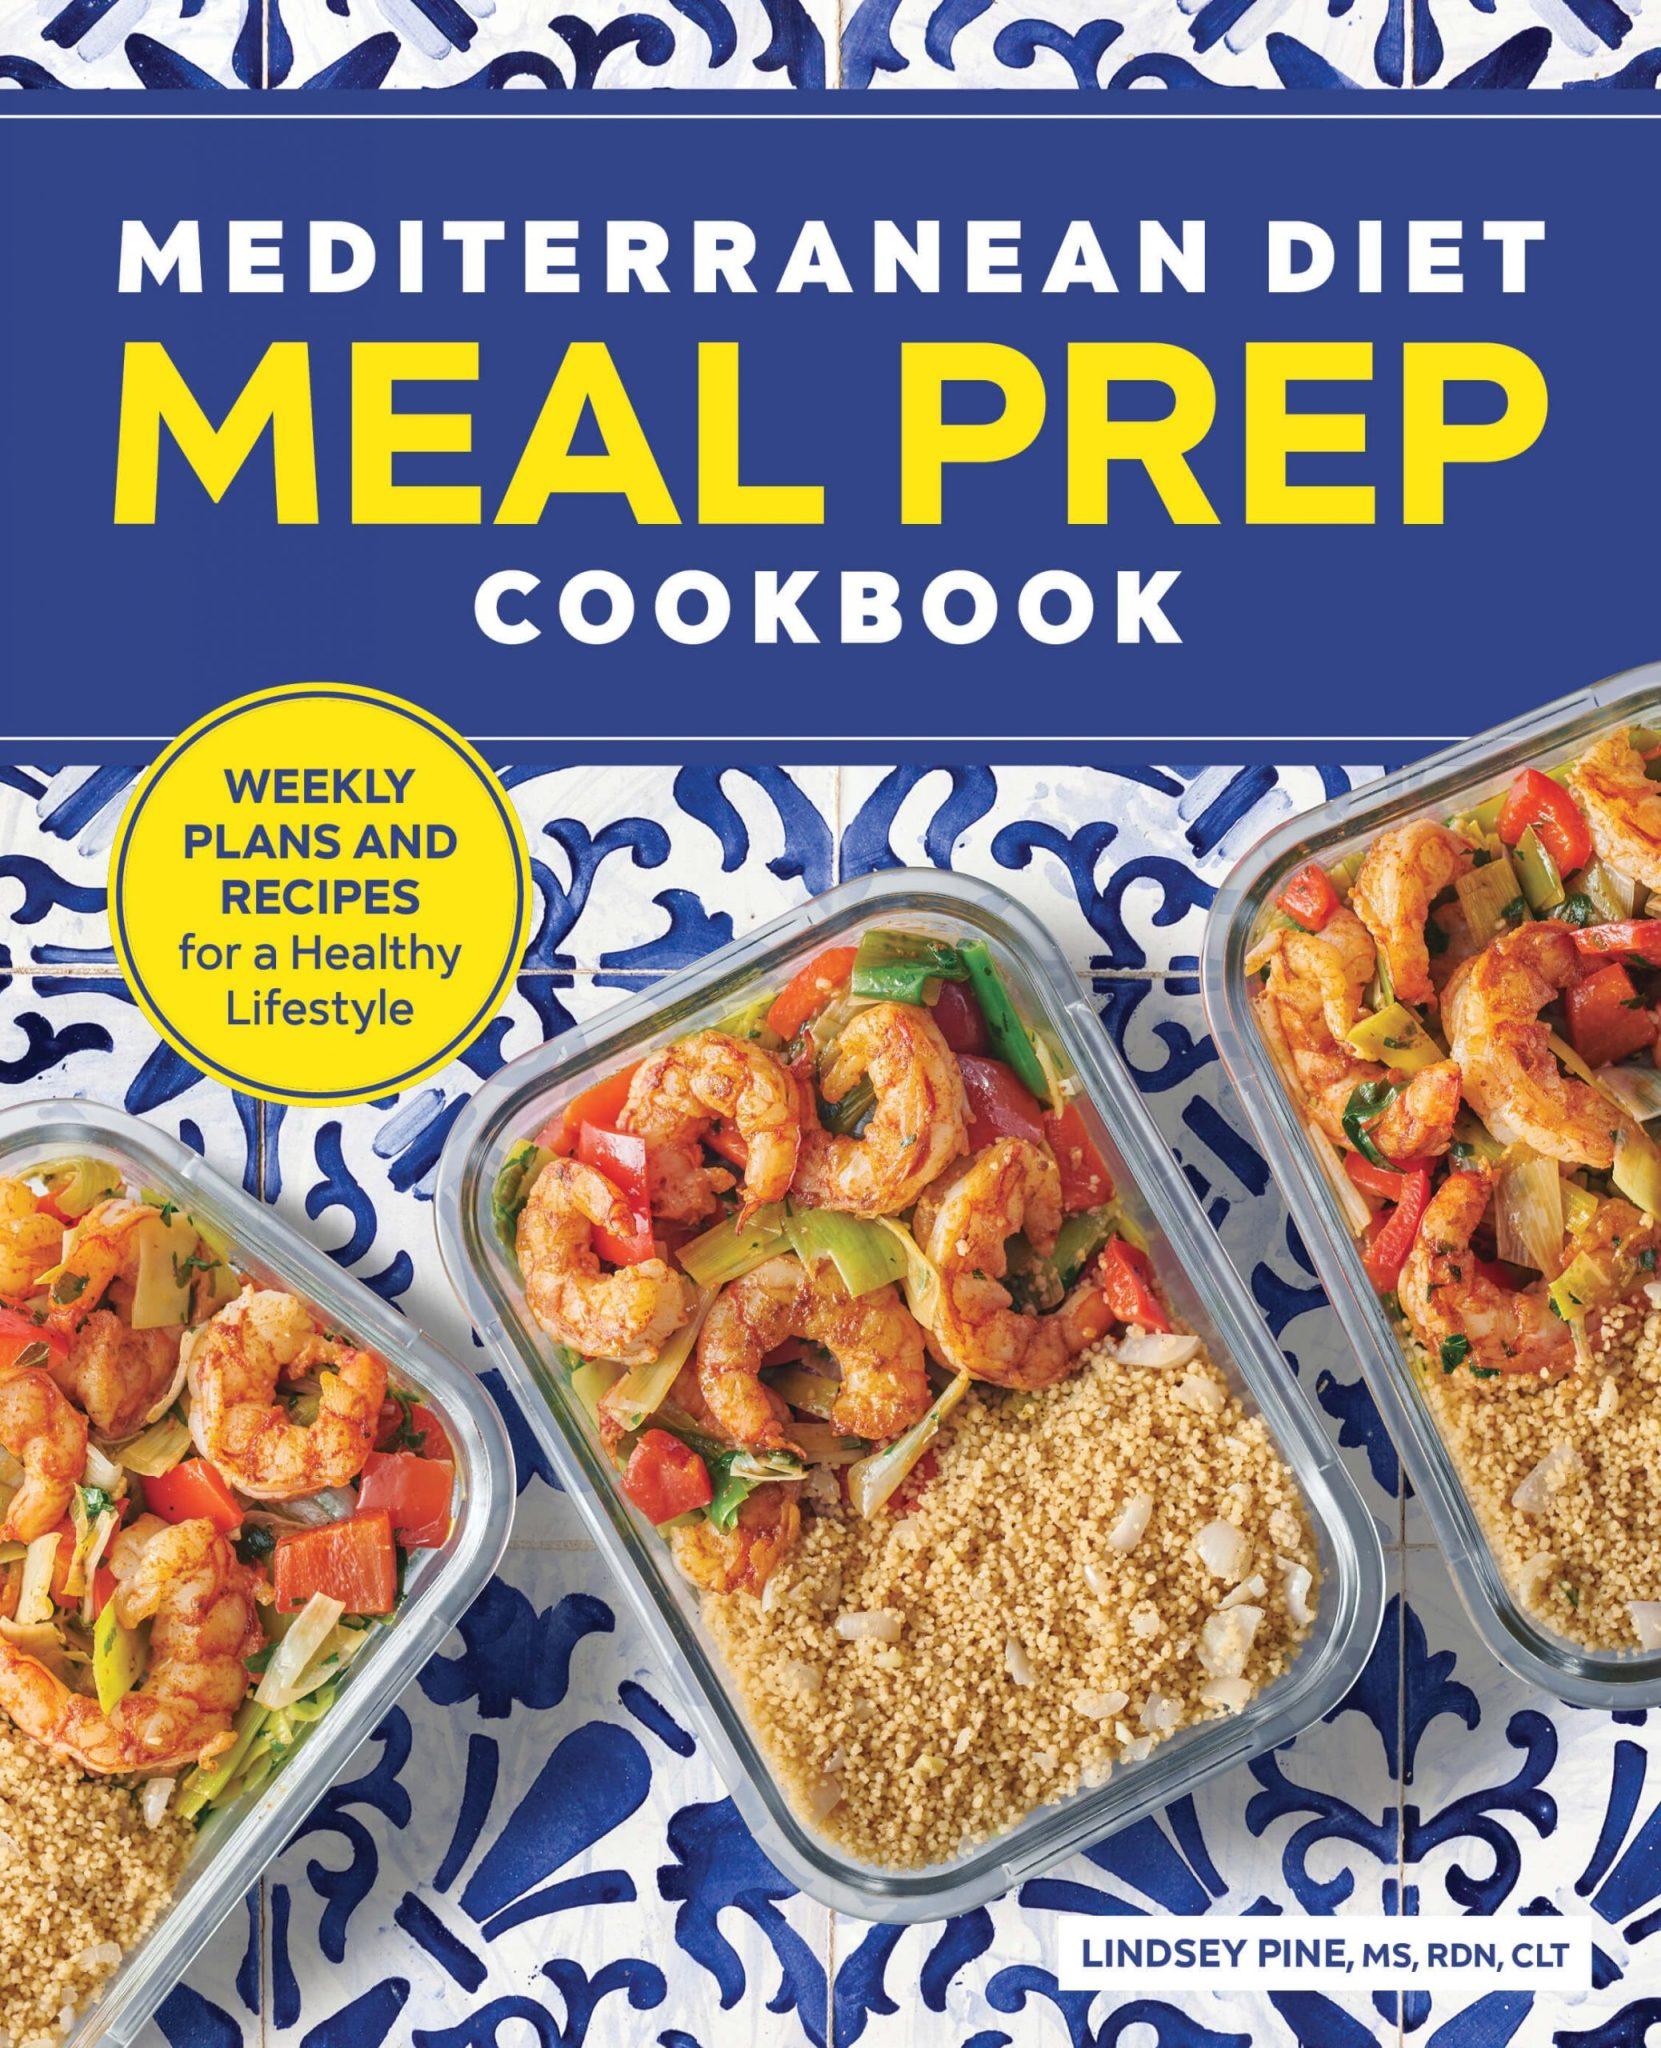 blue cover of mediterranean diet meal prep cookbook